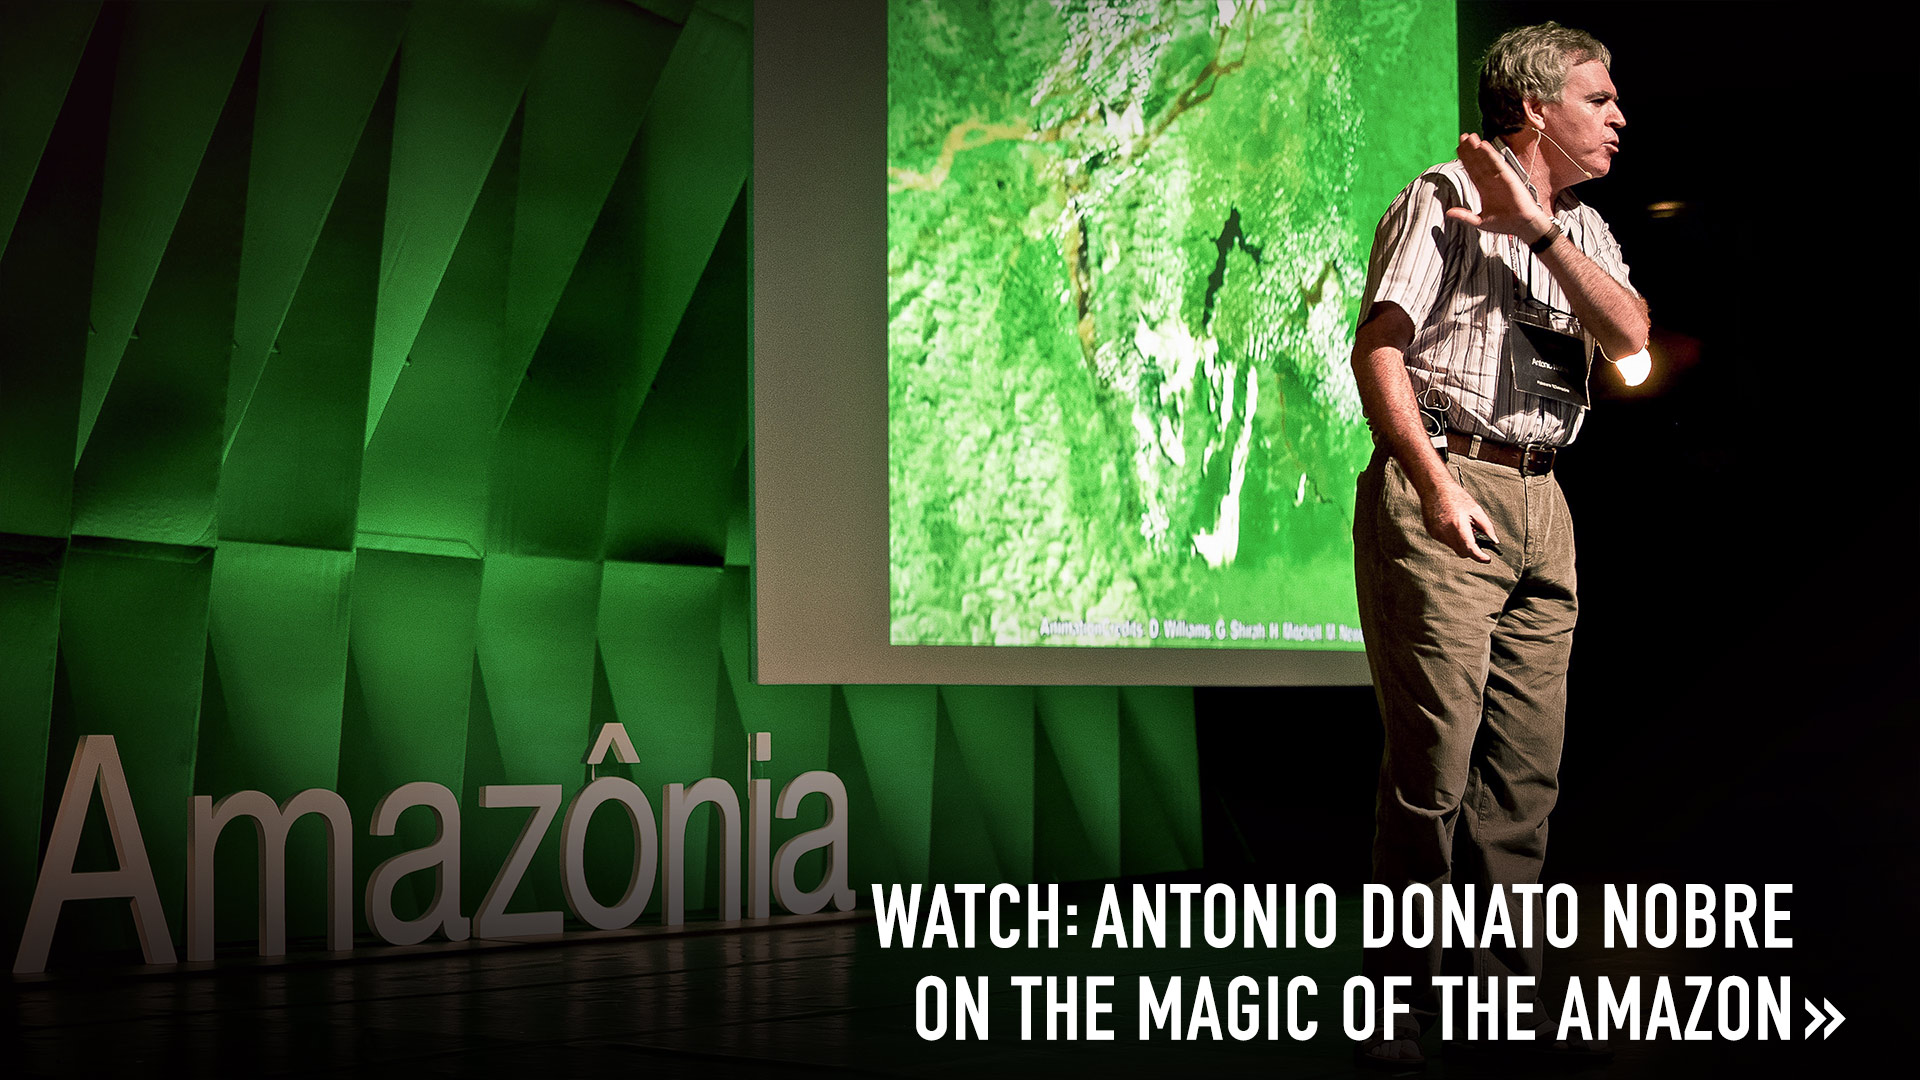 Antonio_Donato_Nobre_Amazon_TEDTalk